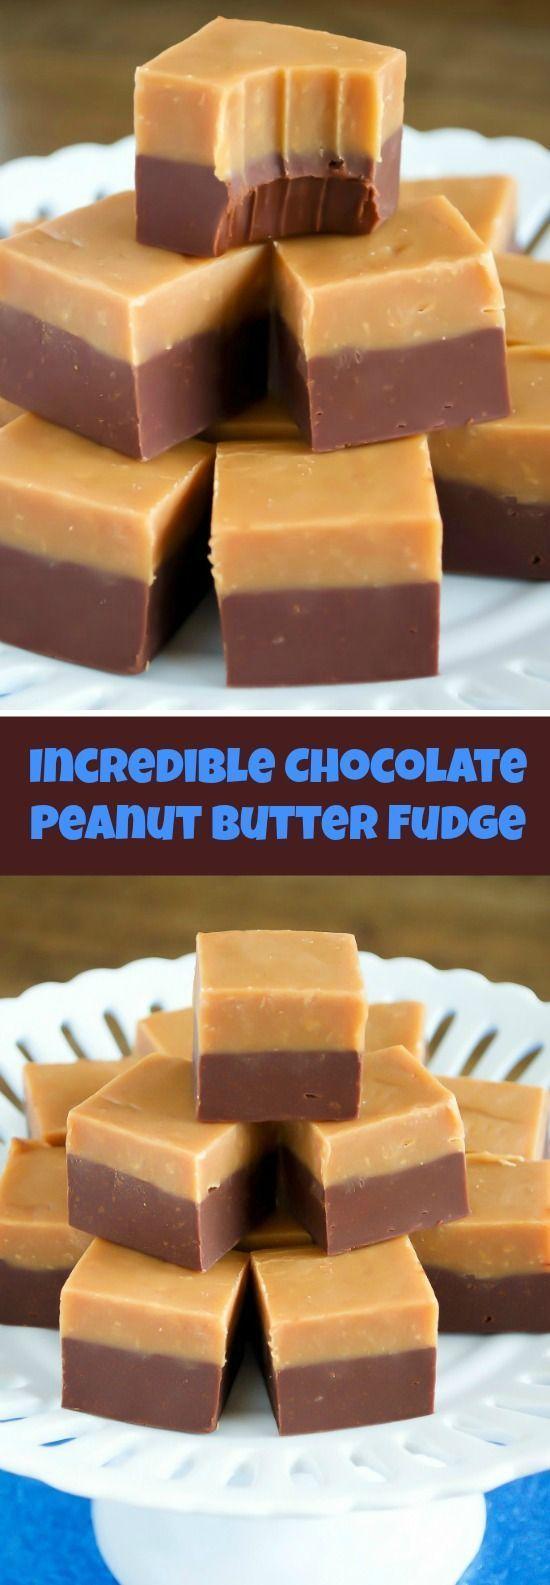 EASY Double Decker Chocolate Peanut Butter Fudge Recipe